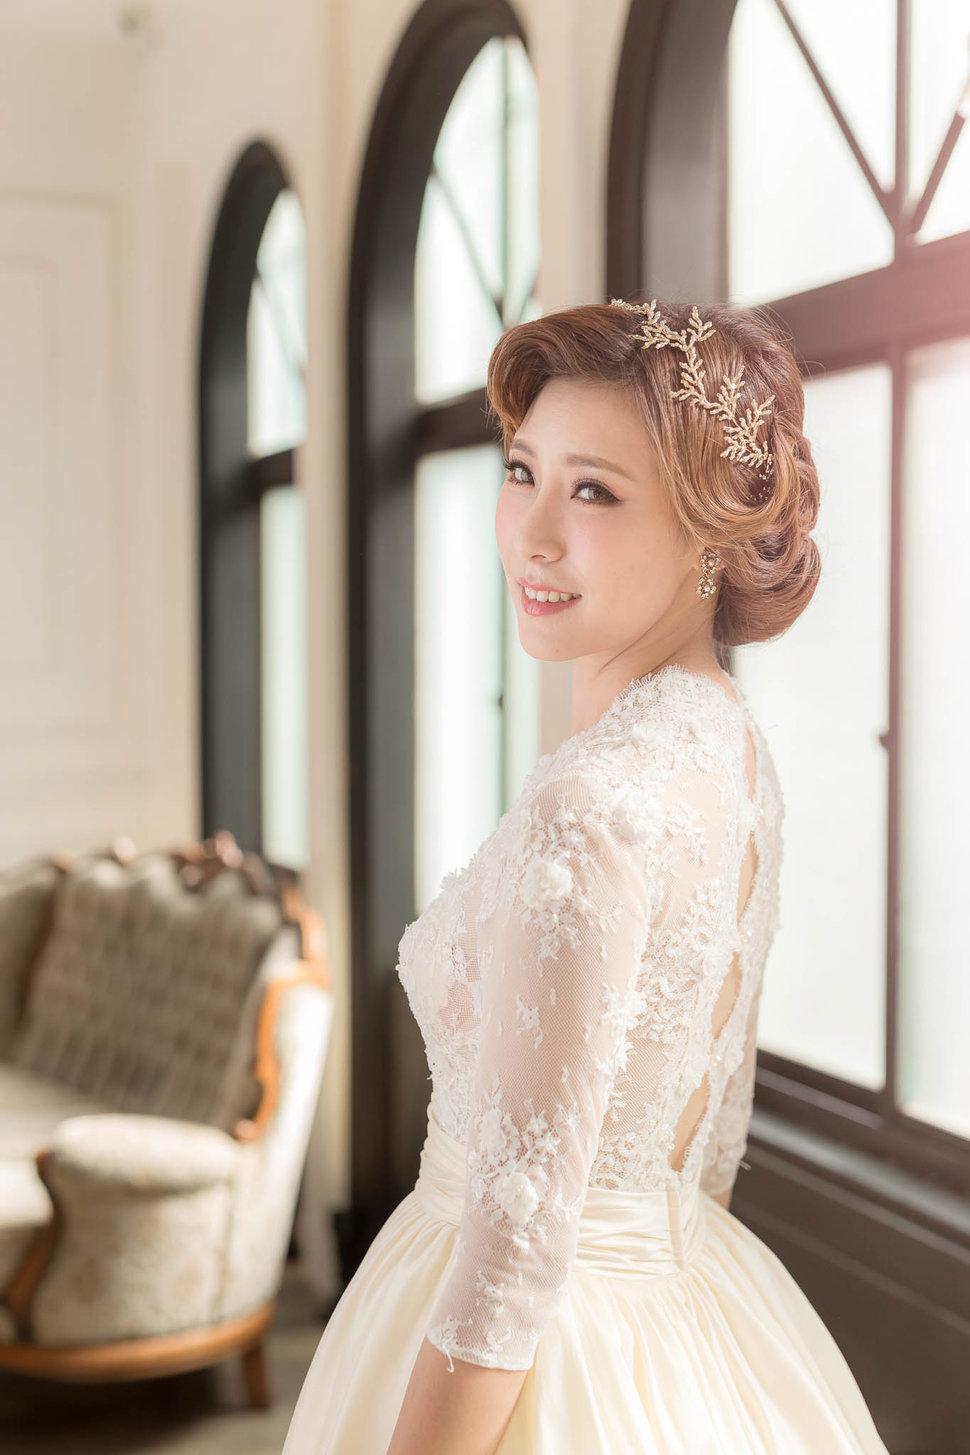 18PHOTO自主婚紗-潤兒(編號:406249) - 18PHOTO 婚紗影像攝影工作室 - 結婚吧